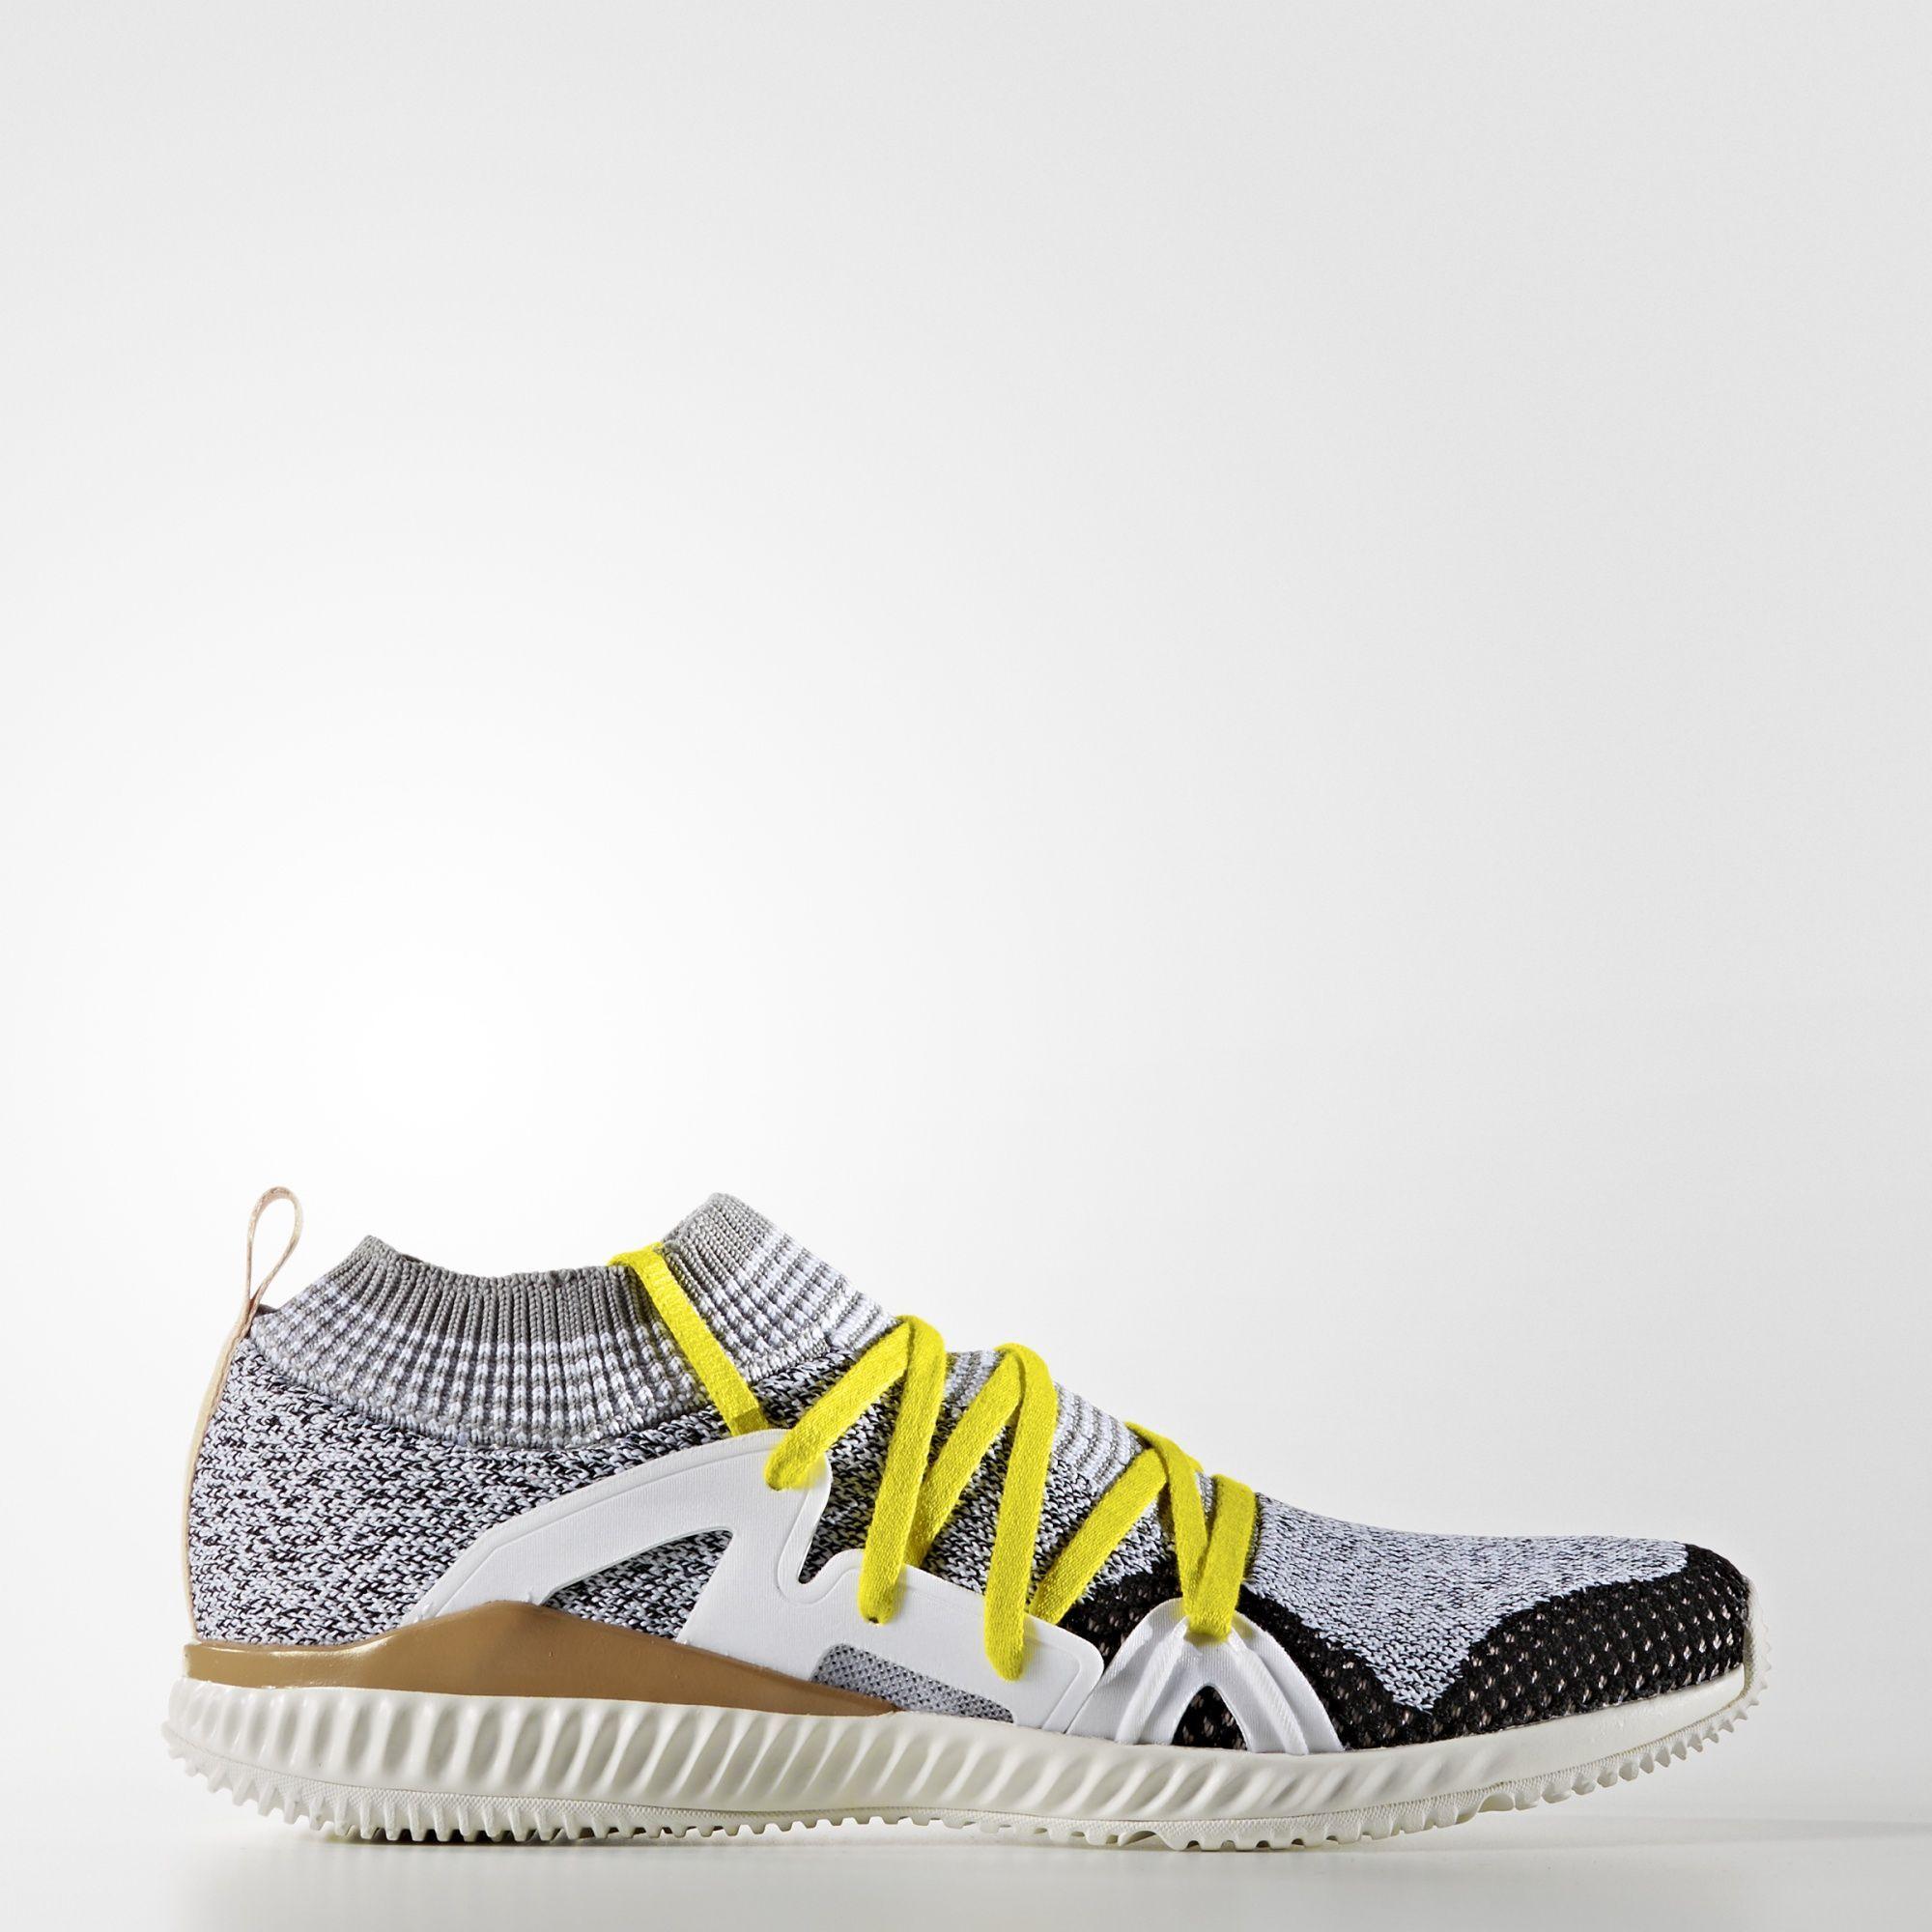 631b98398d372 adidas - Crazy Bounce Training Shoes. adidas - Stella McCartney ...